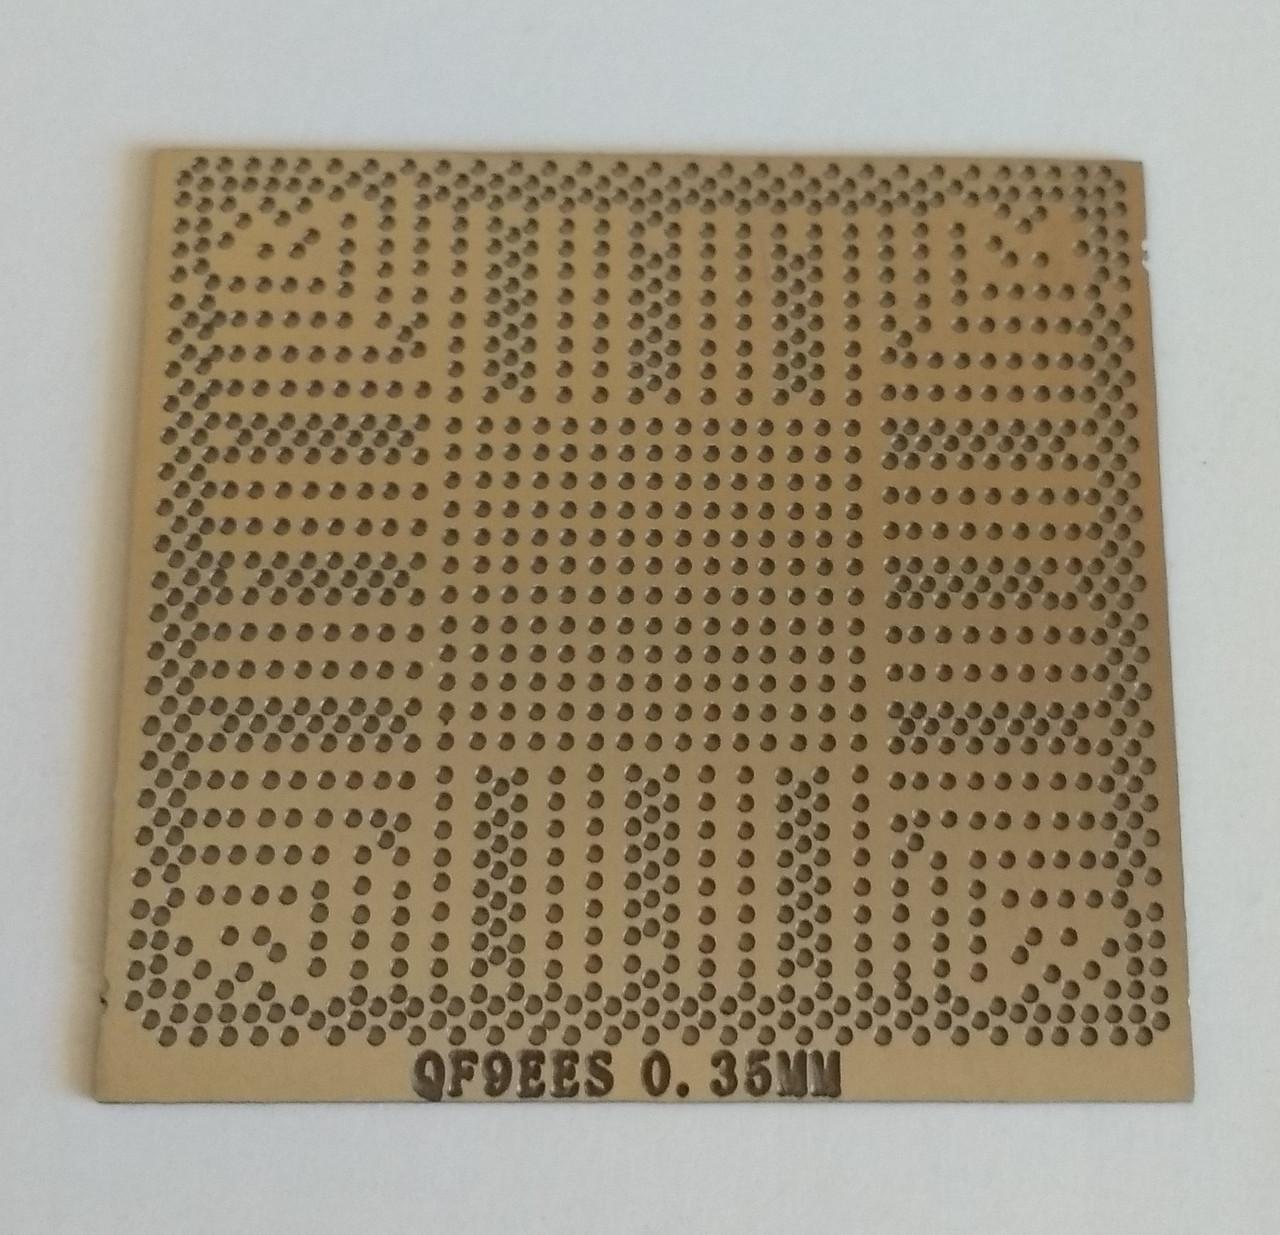 Трафарет BGA Intel QF9EES